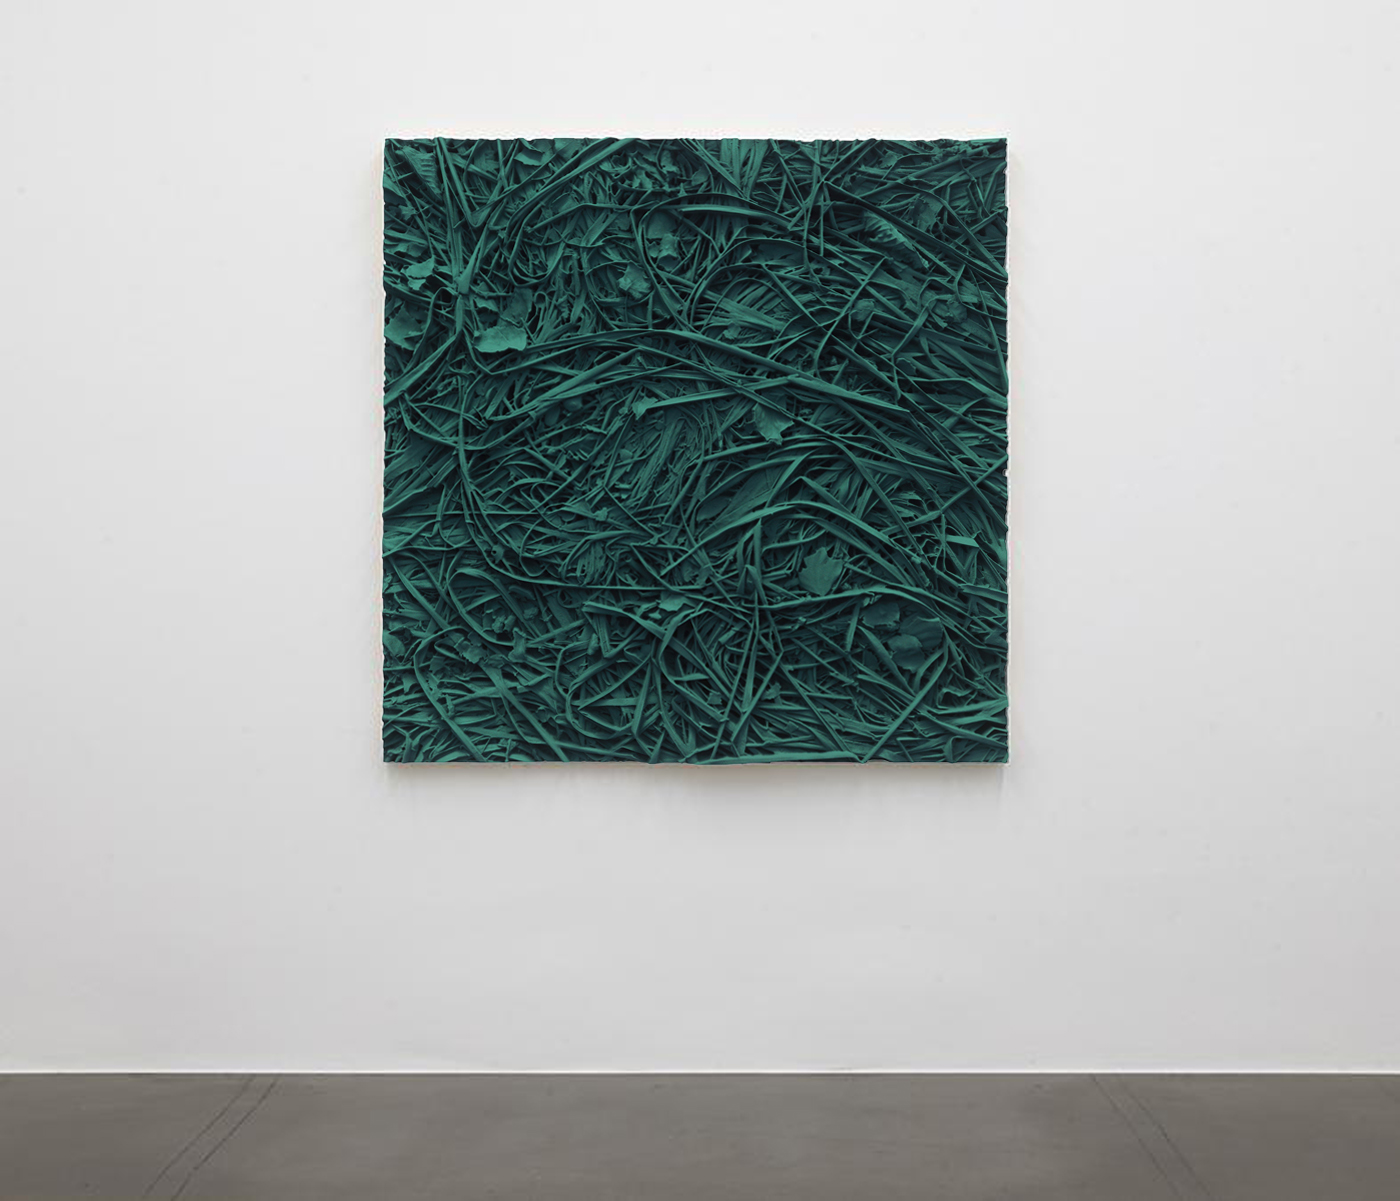 juri-markkula-rgb-jord-lars-bohman-gallery-6